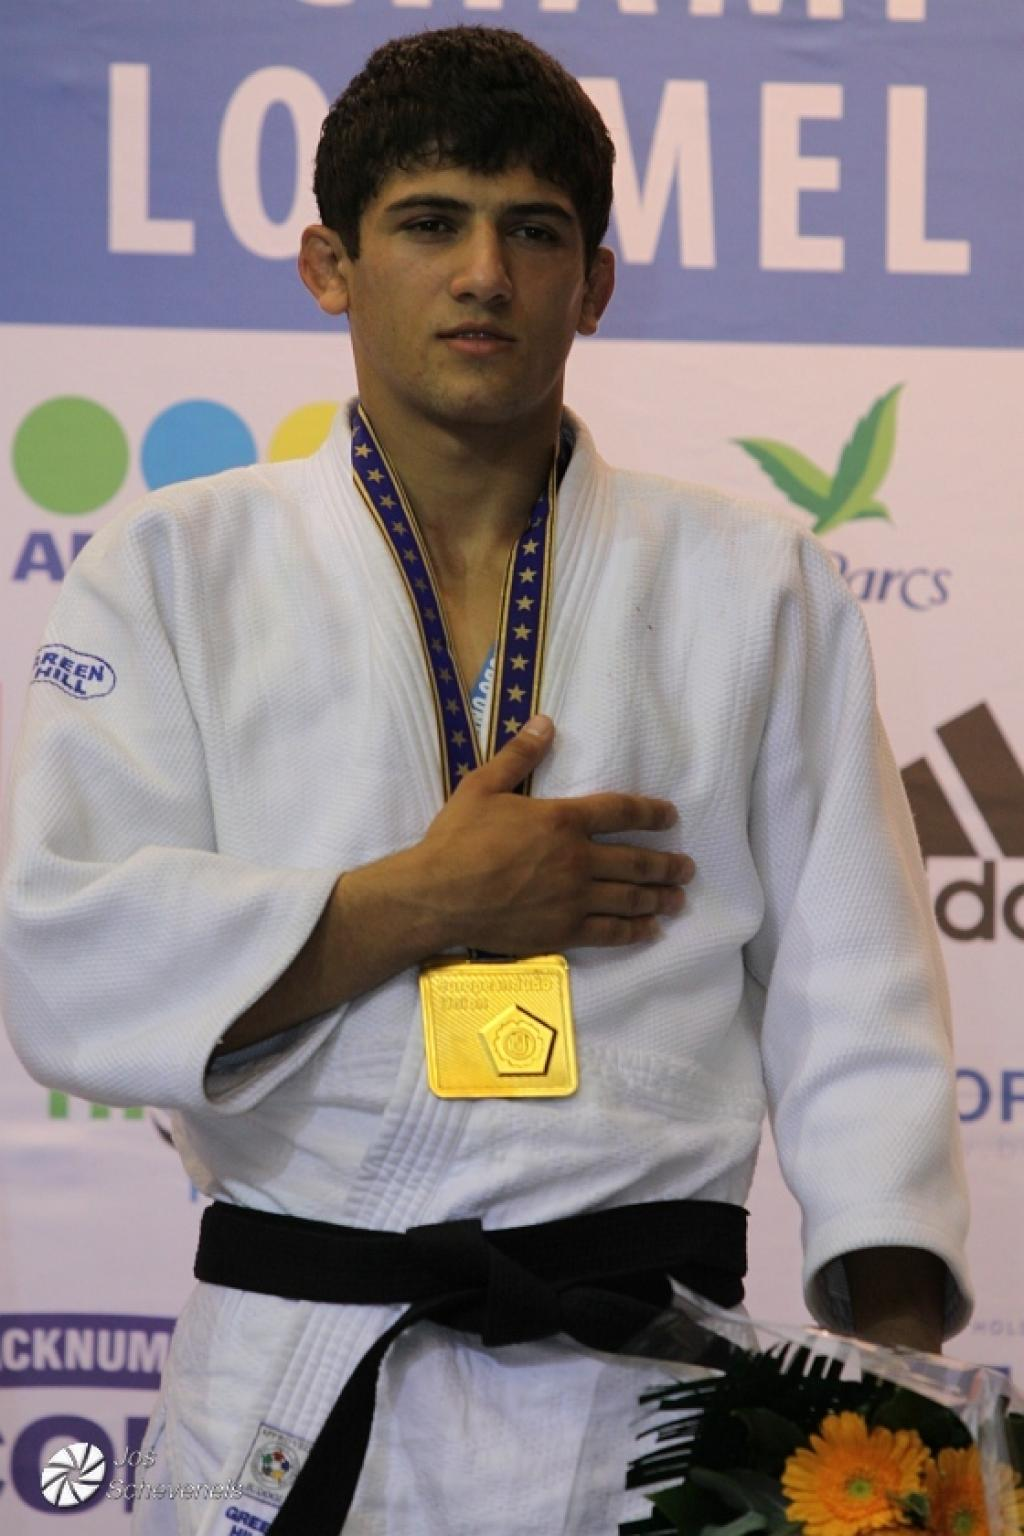 Sarajevo ready to host the elite judo hopes for 2016